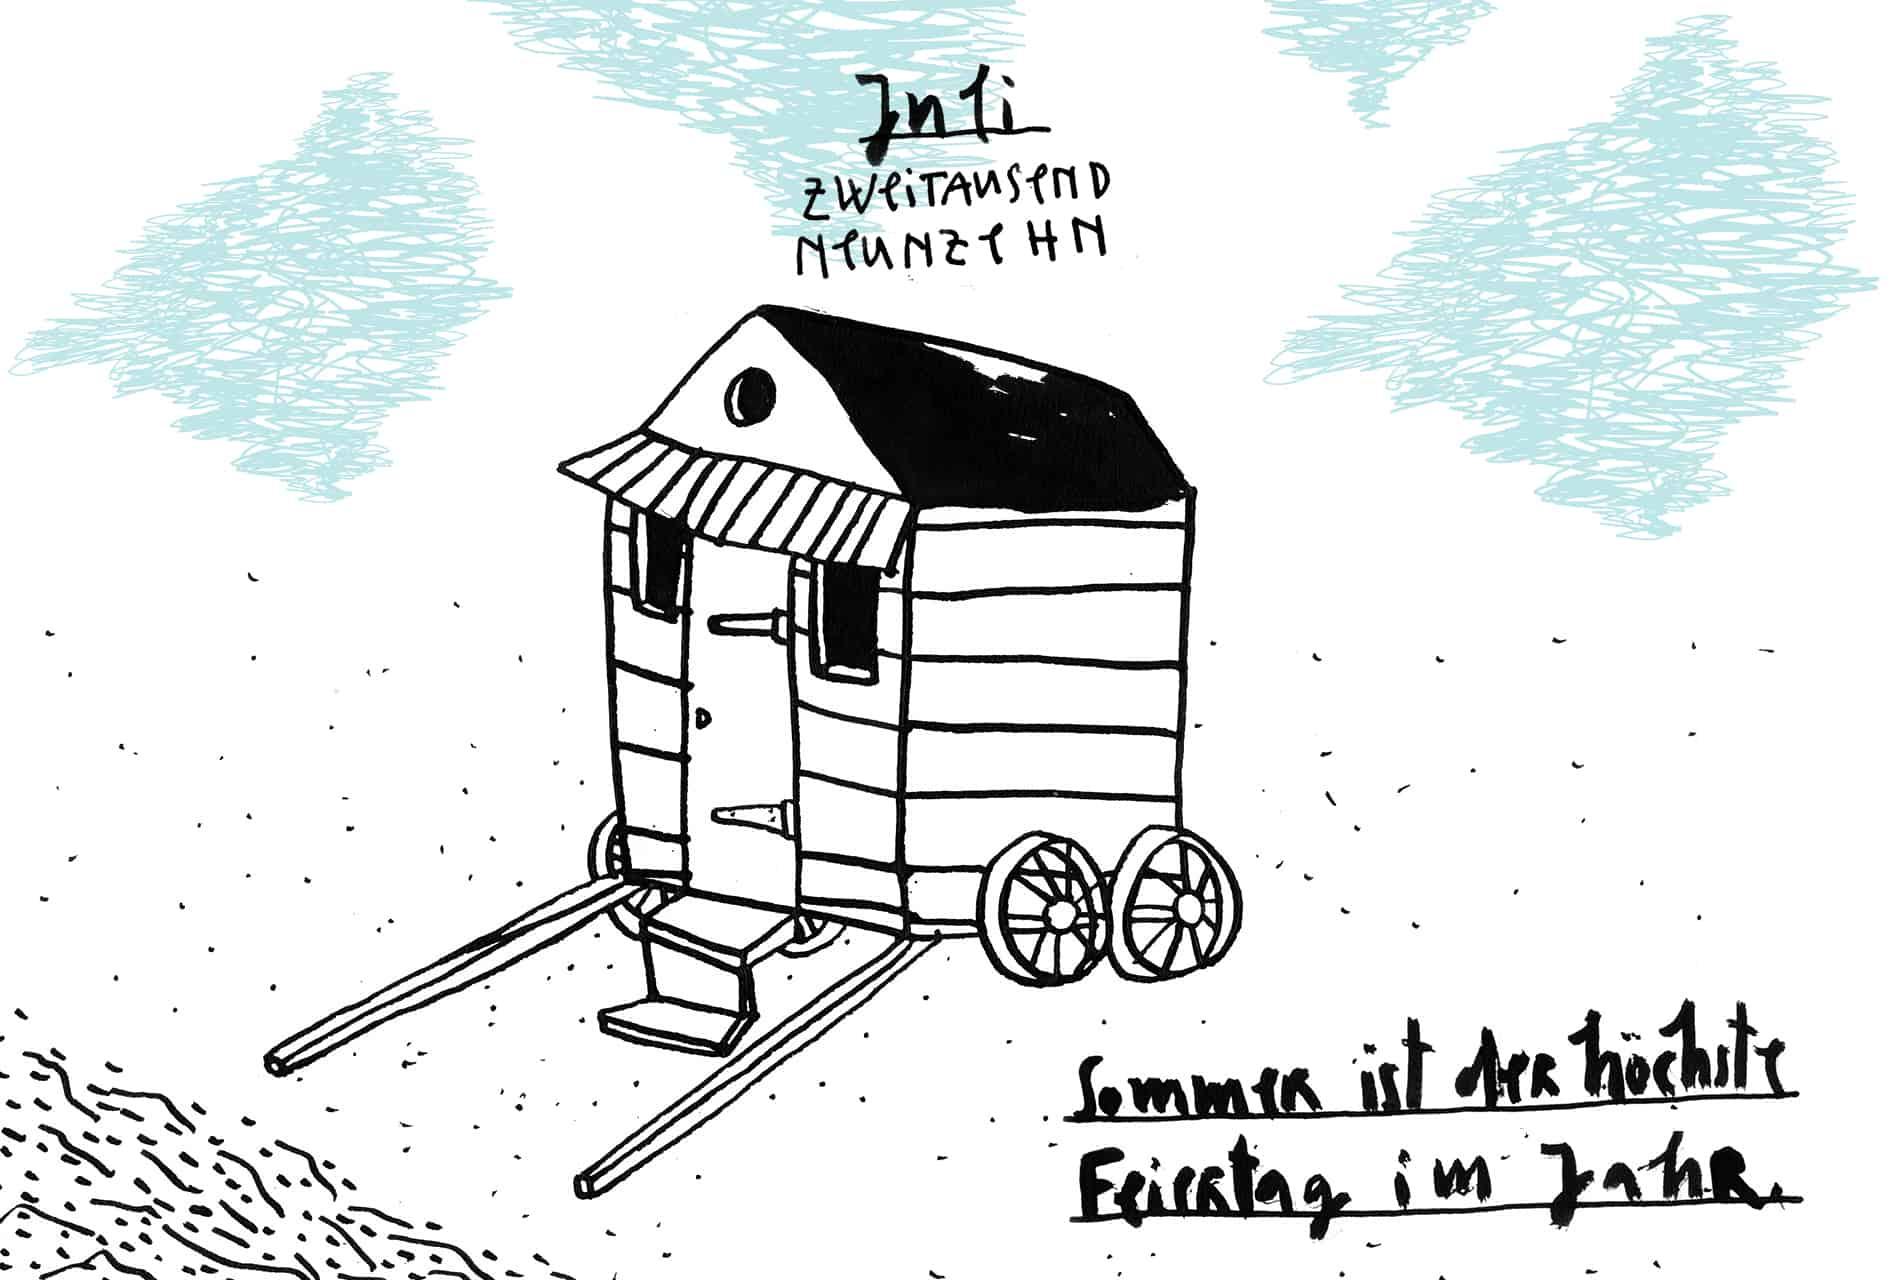 Matrosenhunde Illustration Zeichnung Illustratorin Text Prosa Monatskalender juli Strand Badehaus